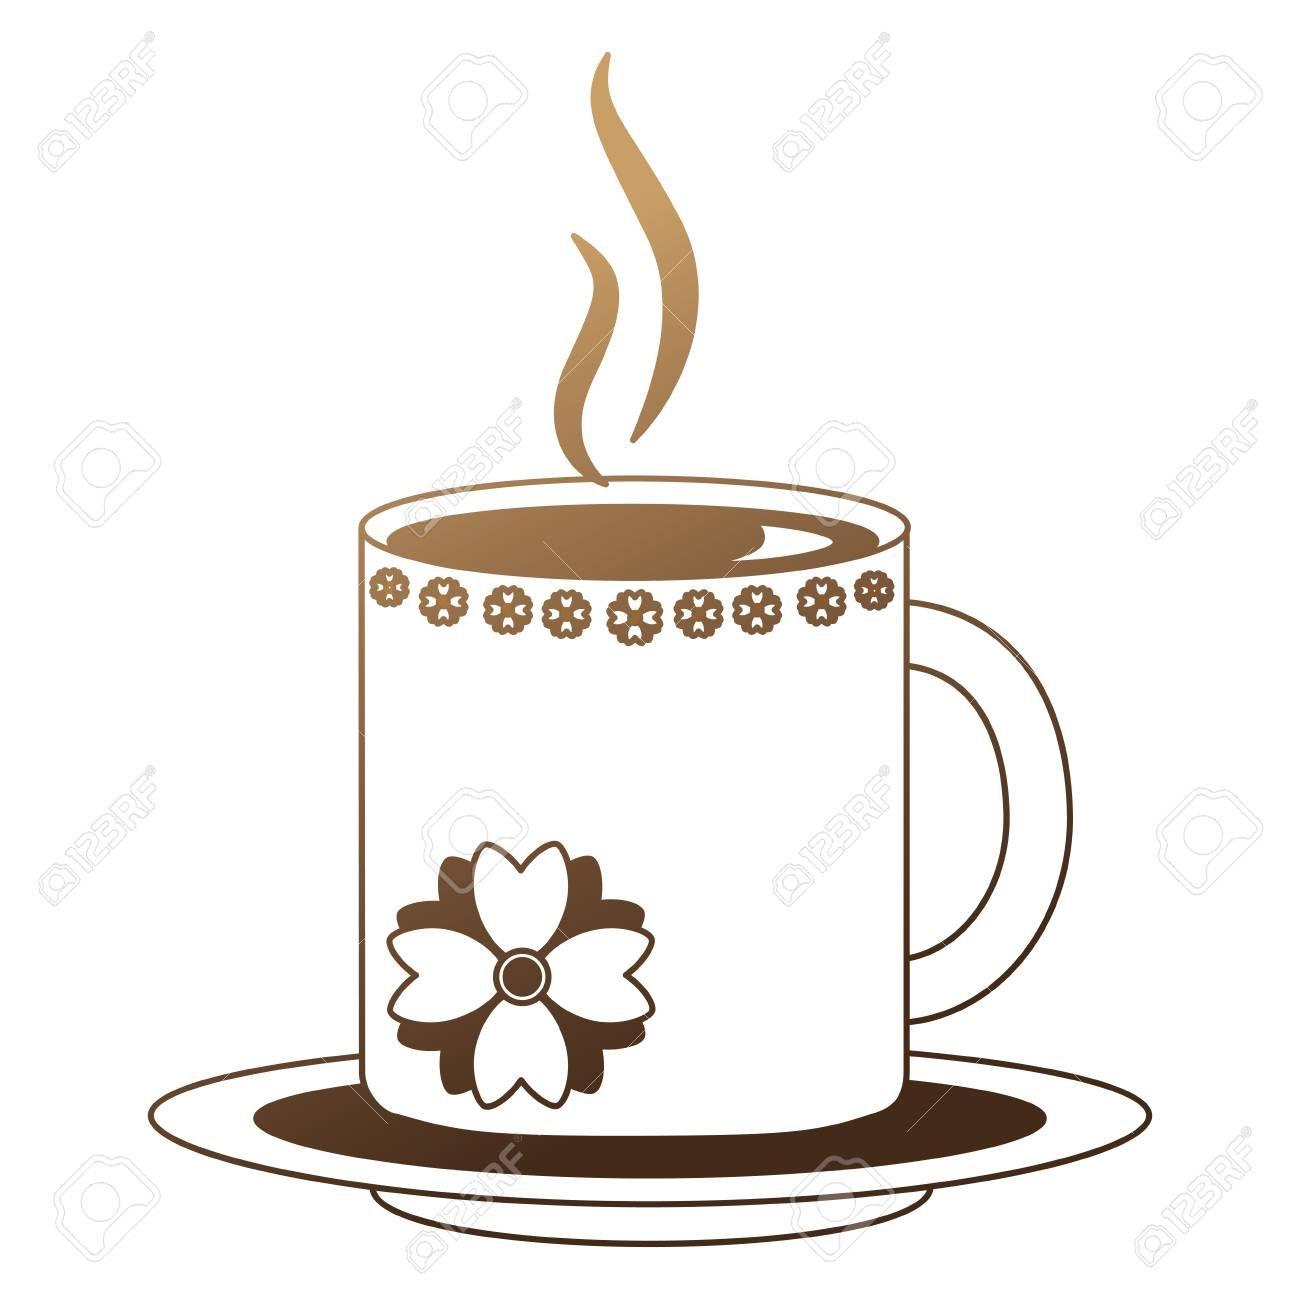 hot beverage decorative coffee mug on dish vector illustration neon design Illustration